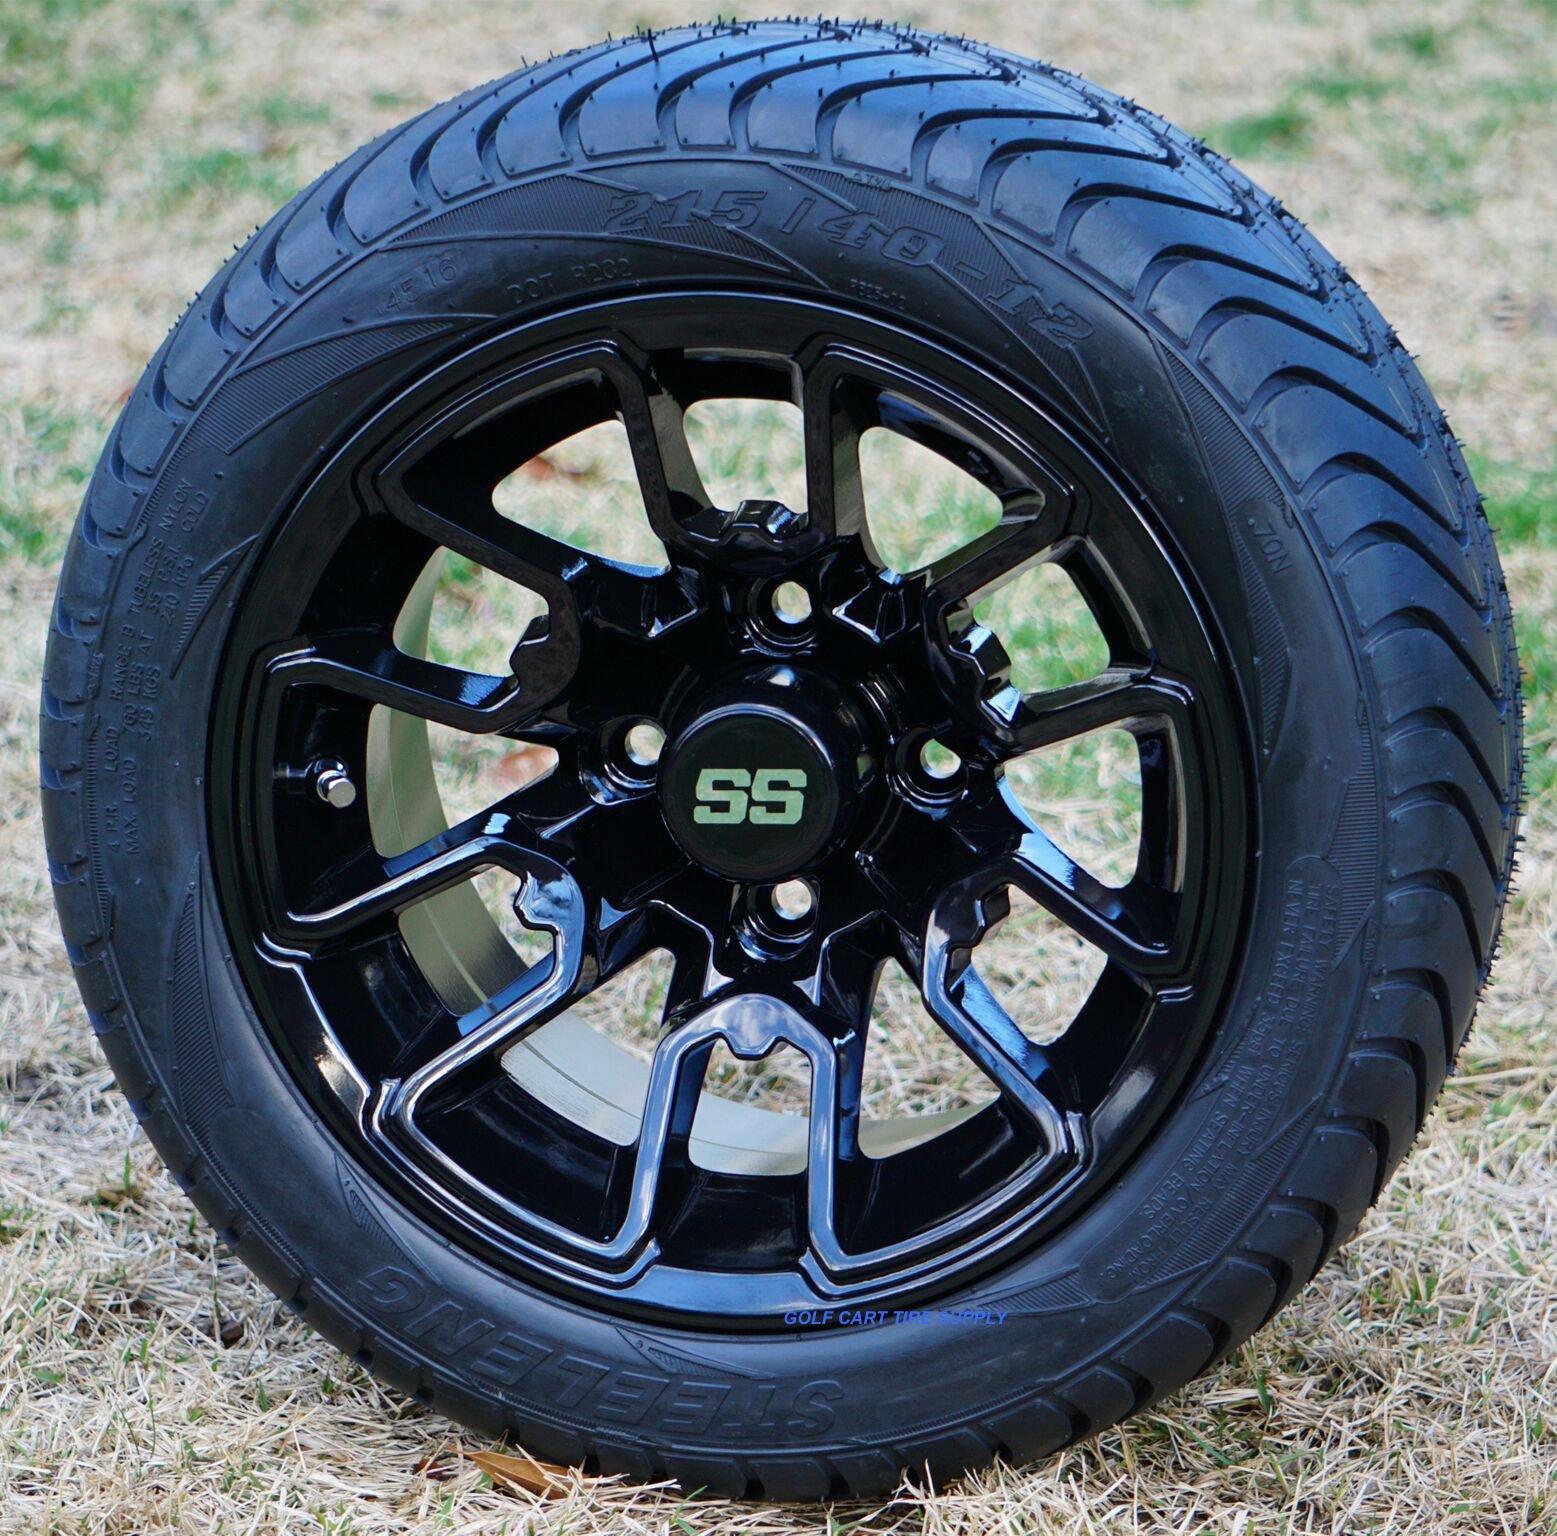 12'' LIZARD Black Aluminum Golf Cart Wheels and 215/40-12 Low Profile DOT Golf Cart Tires Combo - Set of 4